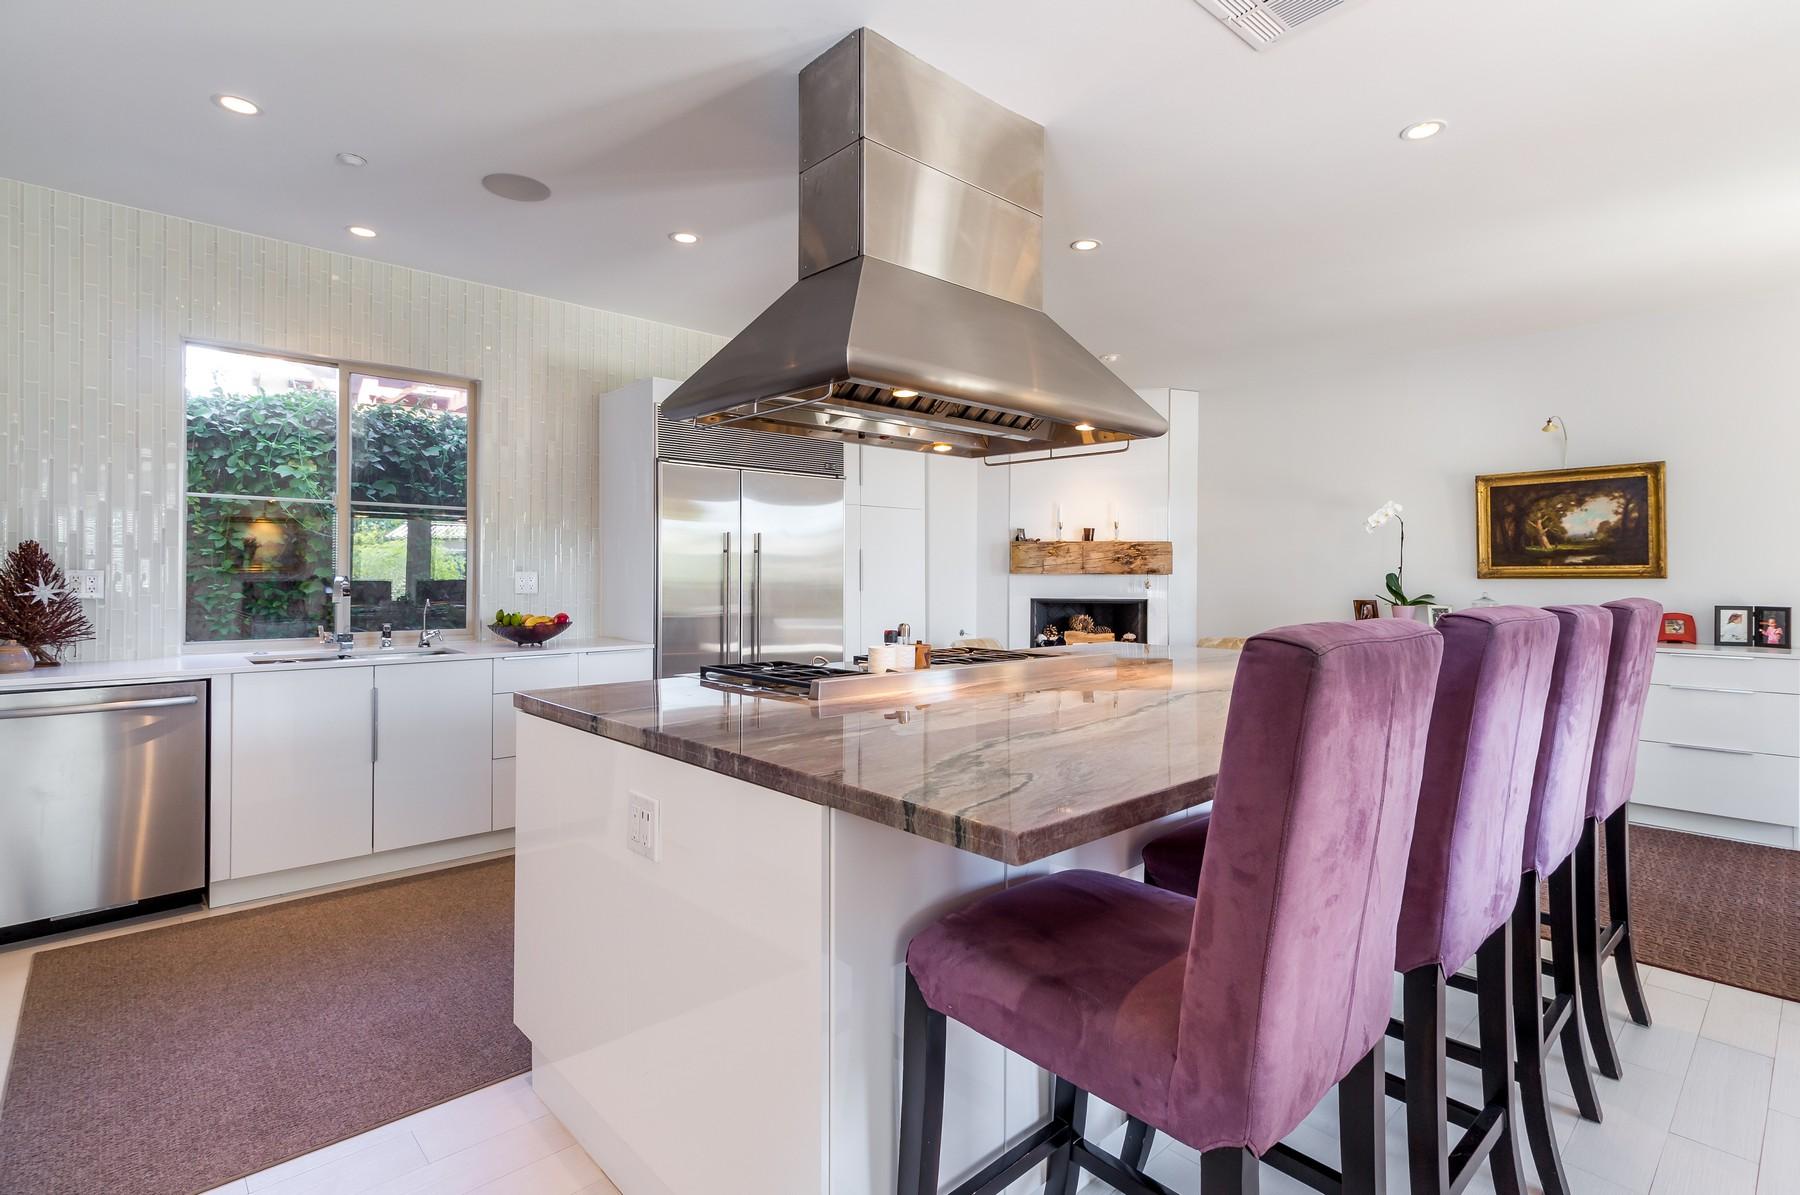 Single Family Home for Sale at 14587 Luna Media San Diego, California, 92127 United States